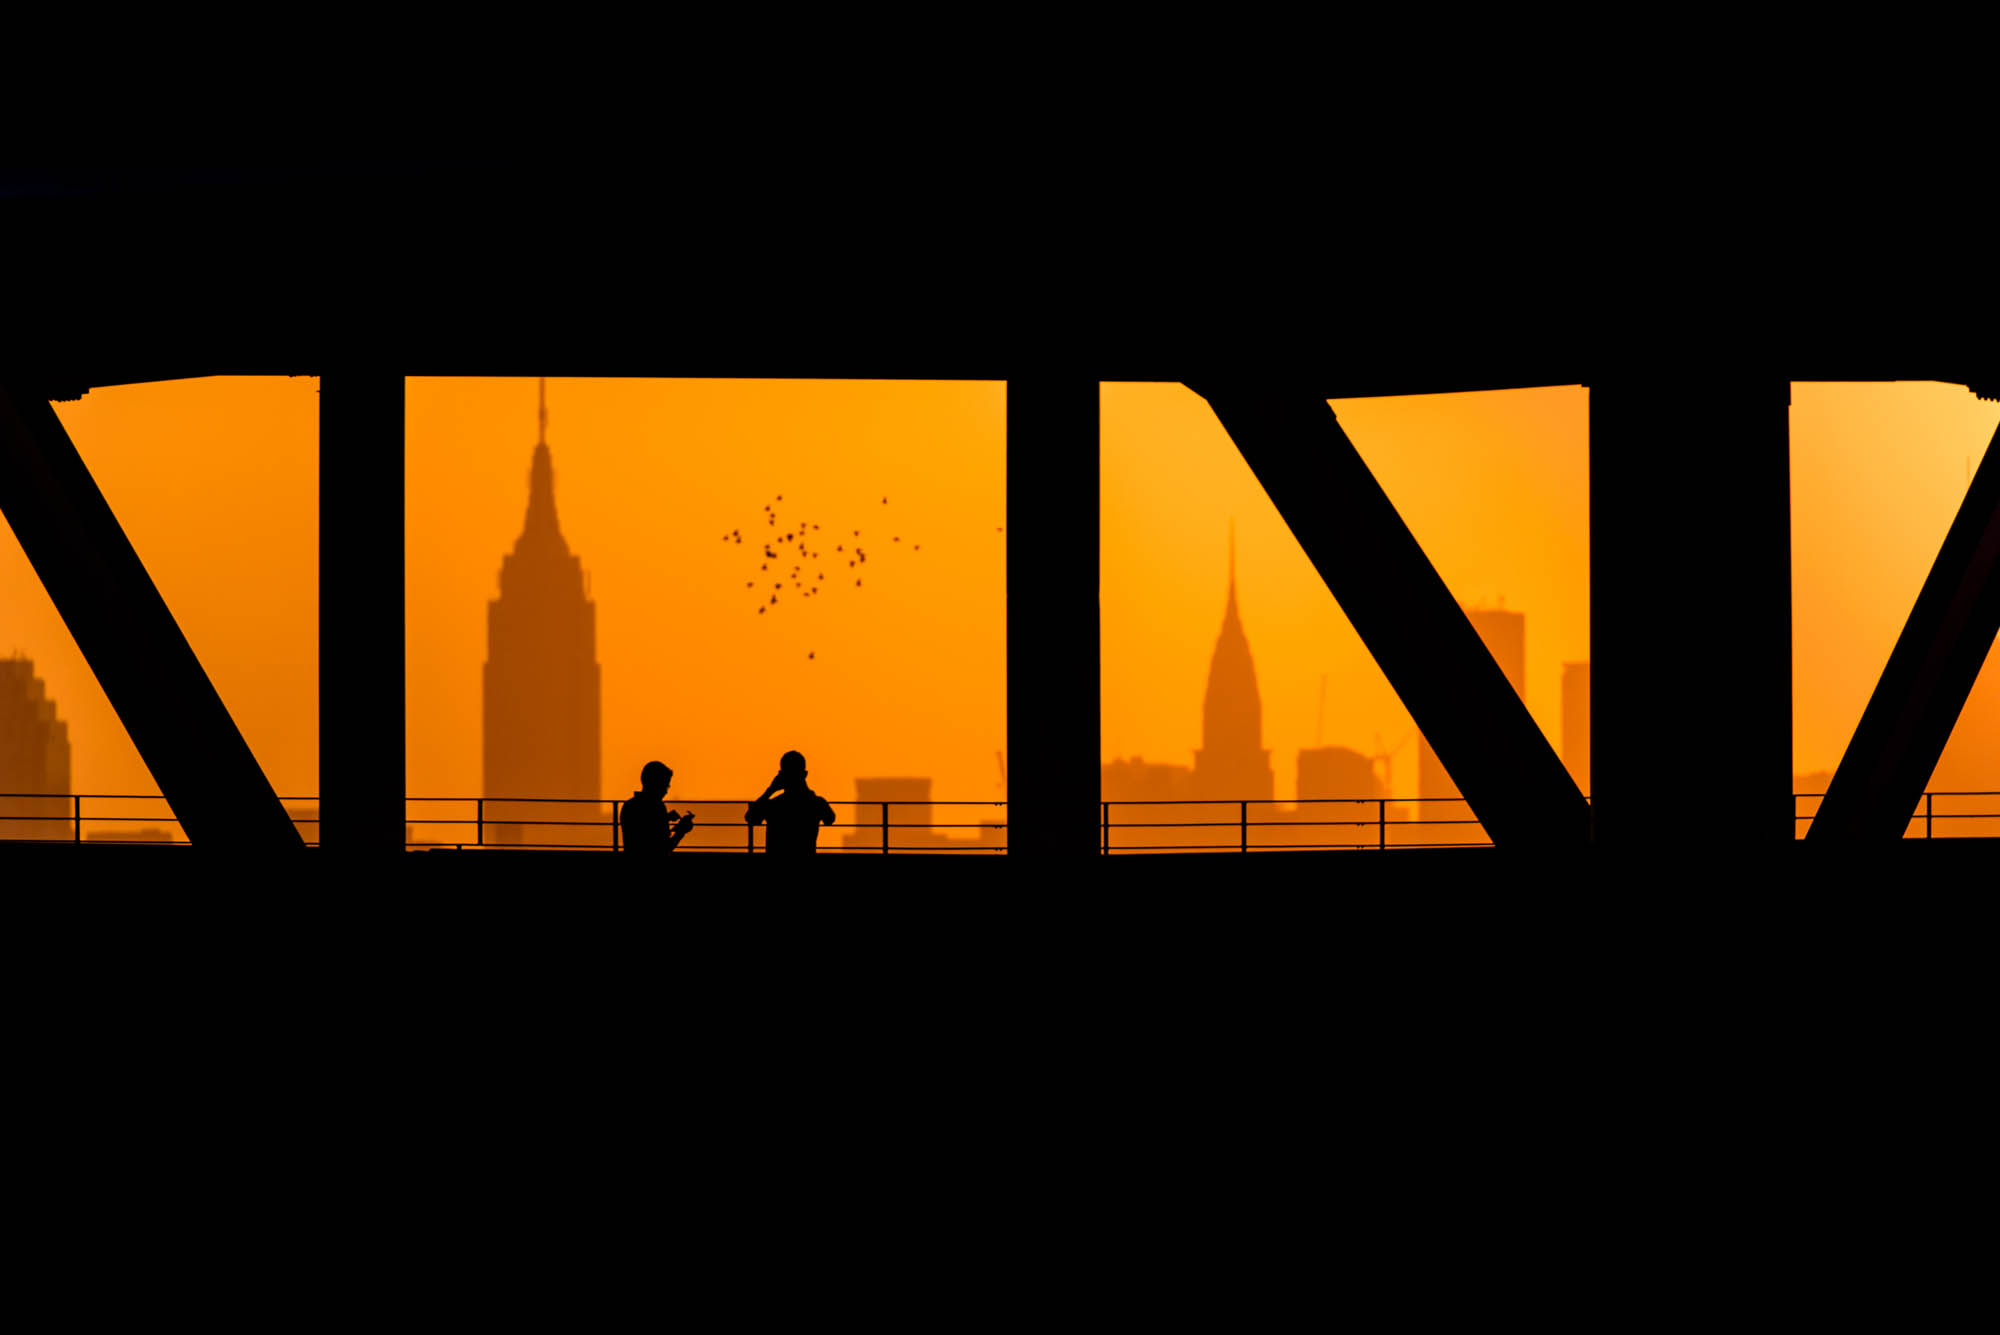 Silhouette of the New York City skyline